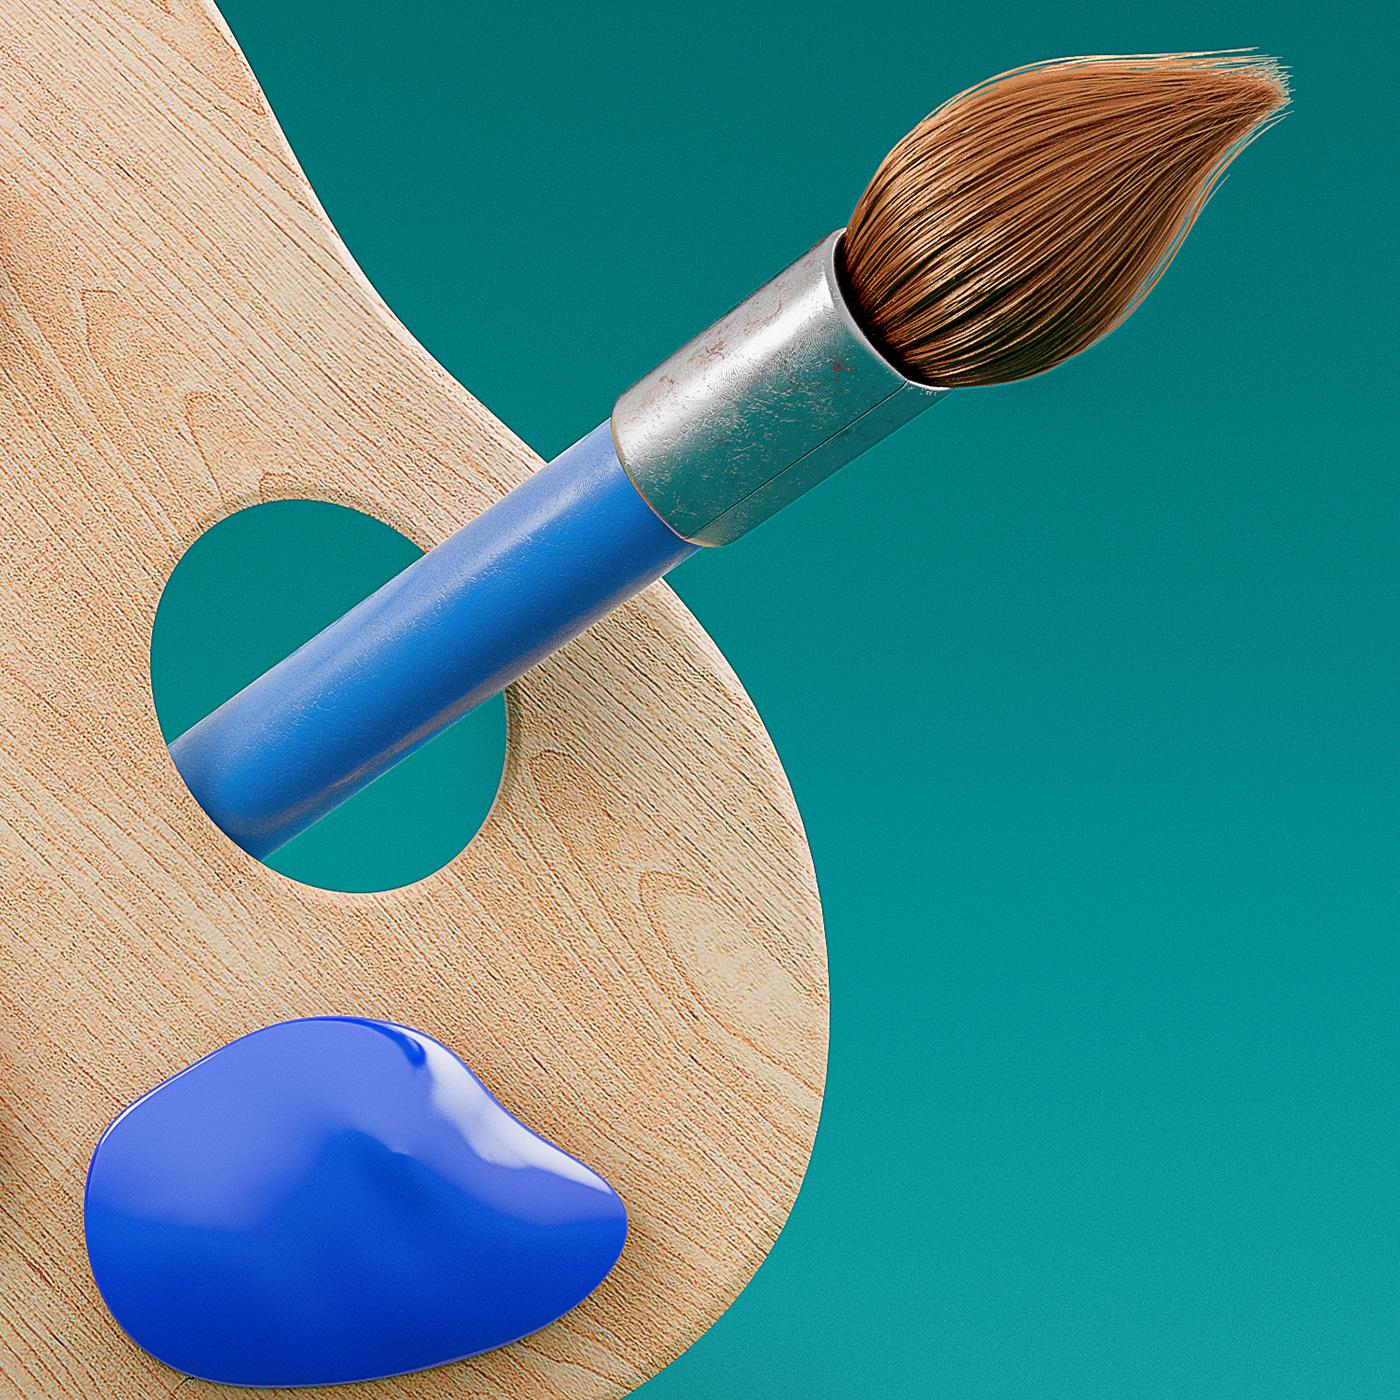 Icon design ILLUSTRATION  3D CGI Digital Art  vray